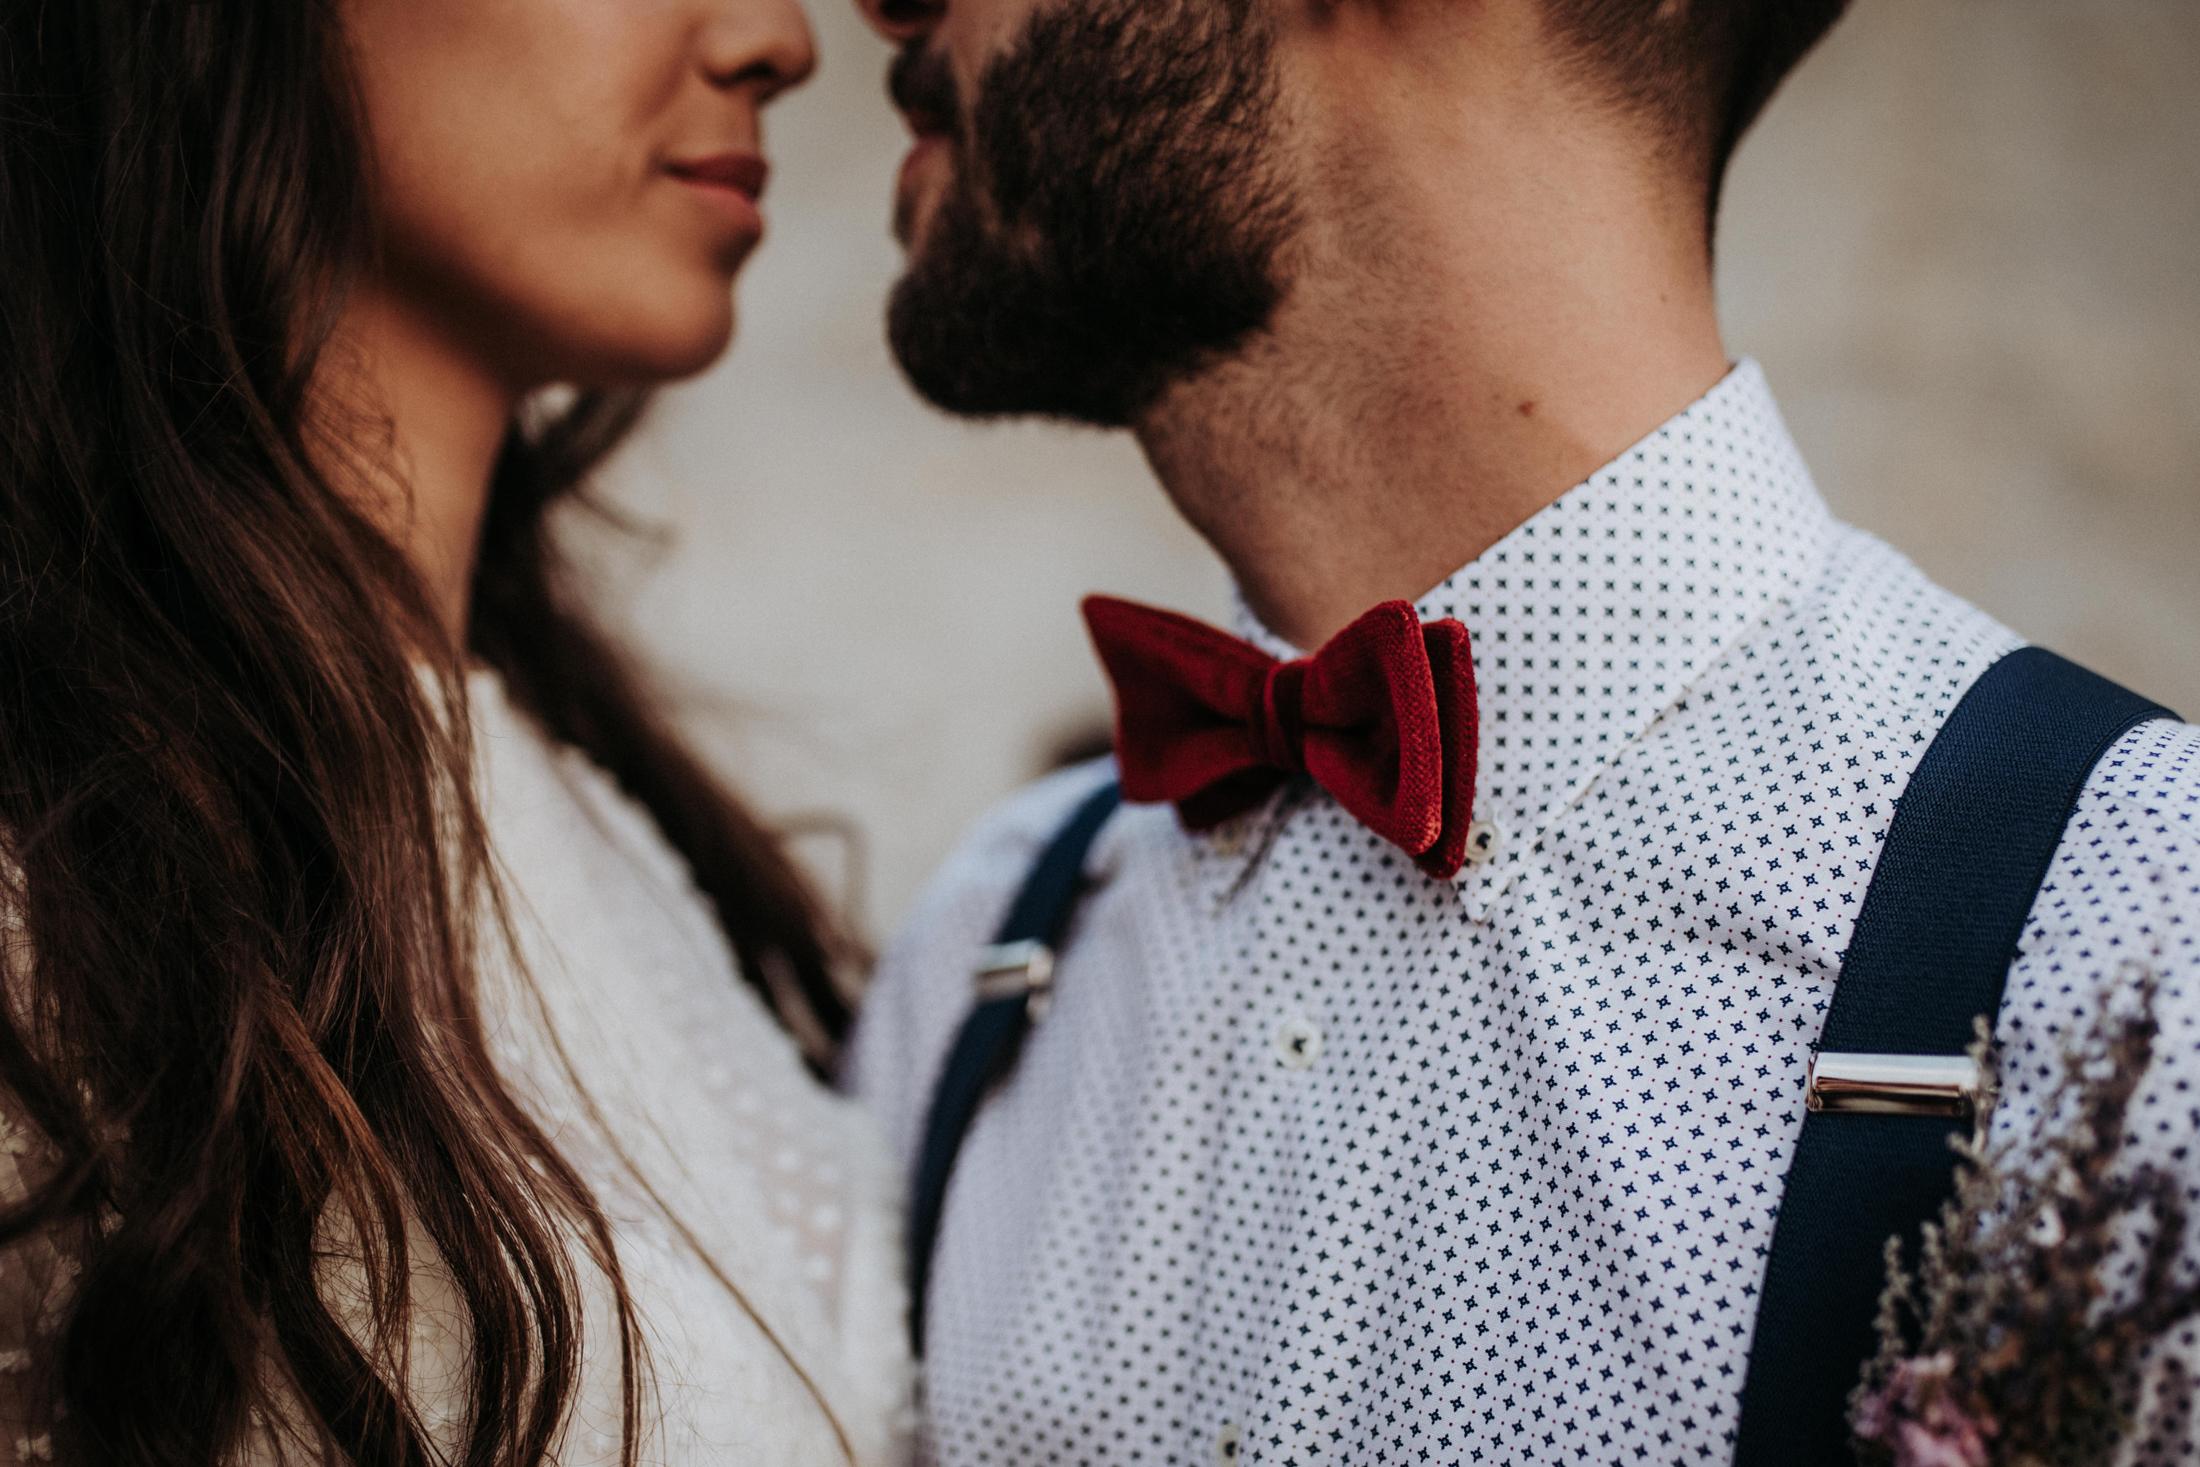 Wedding_Photographer_Mallorca_Daniela-Marquardt_Photography_CanaryIslands_Lanzarote_Iceland_Tuskany_Santorini_Portugal_Schweiz_Austria_Bayern_Elopement_Hochzeitsfotograf_4